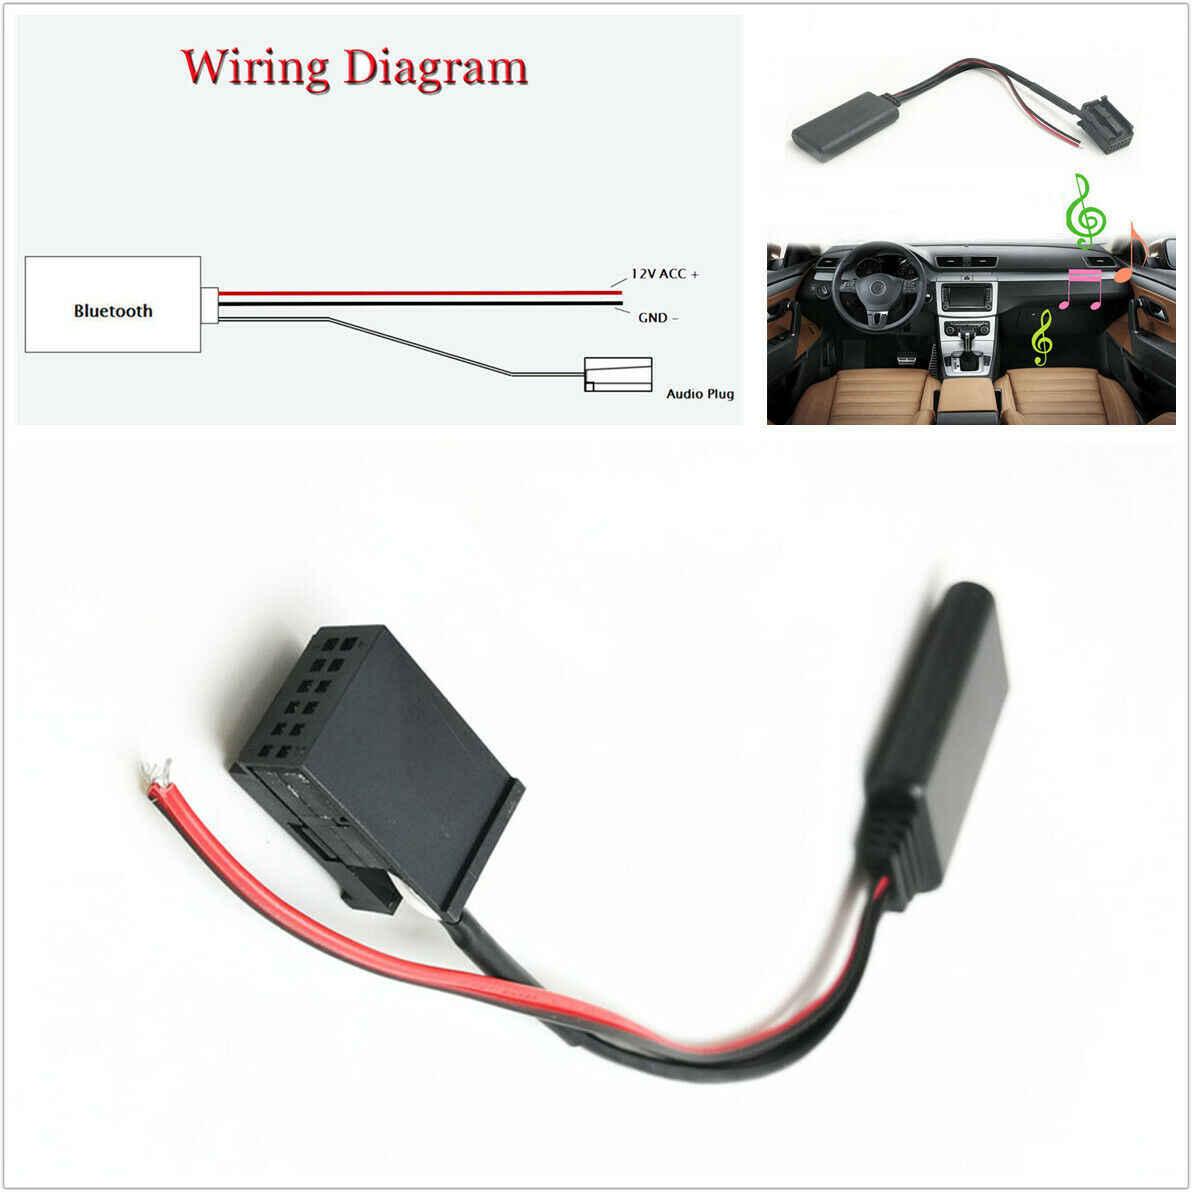 Bluetooth Audio AUX Kabel Adapter Fit für Opel CD30 MP3 CDC40 CD70 NAVI DVD90 AUX Wireless WMA WAV